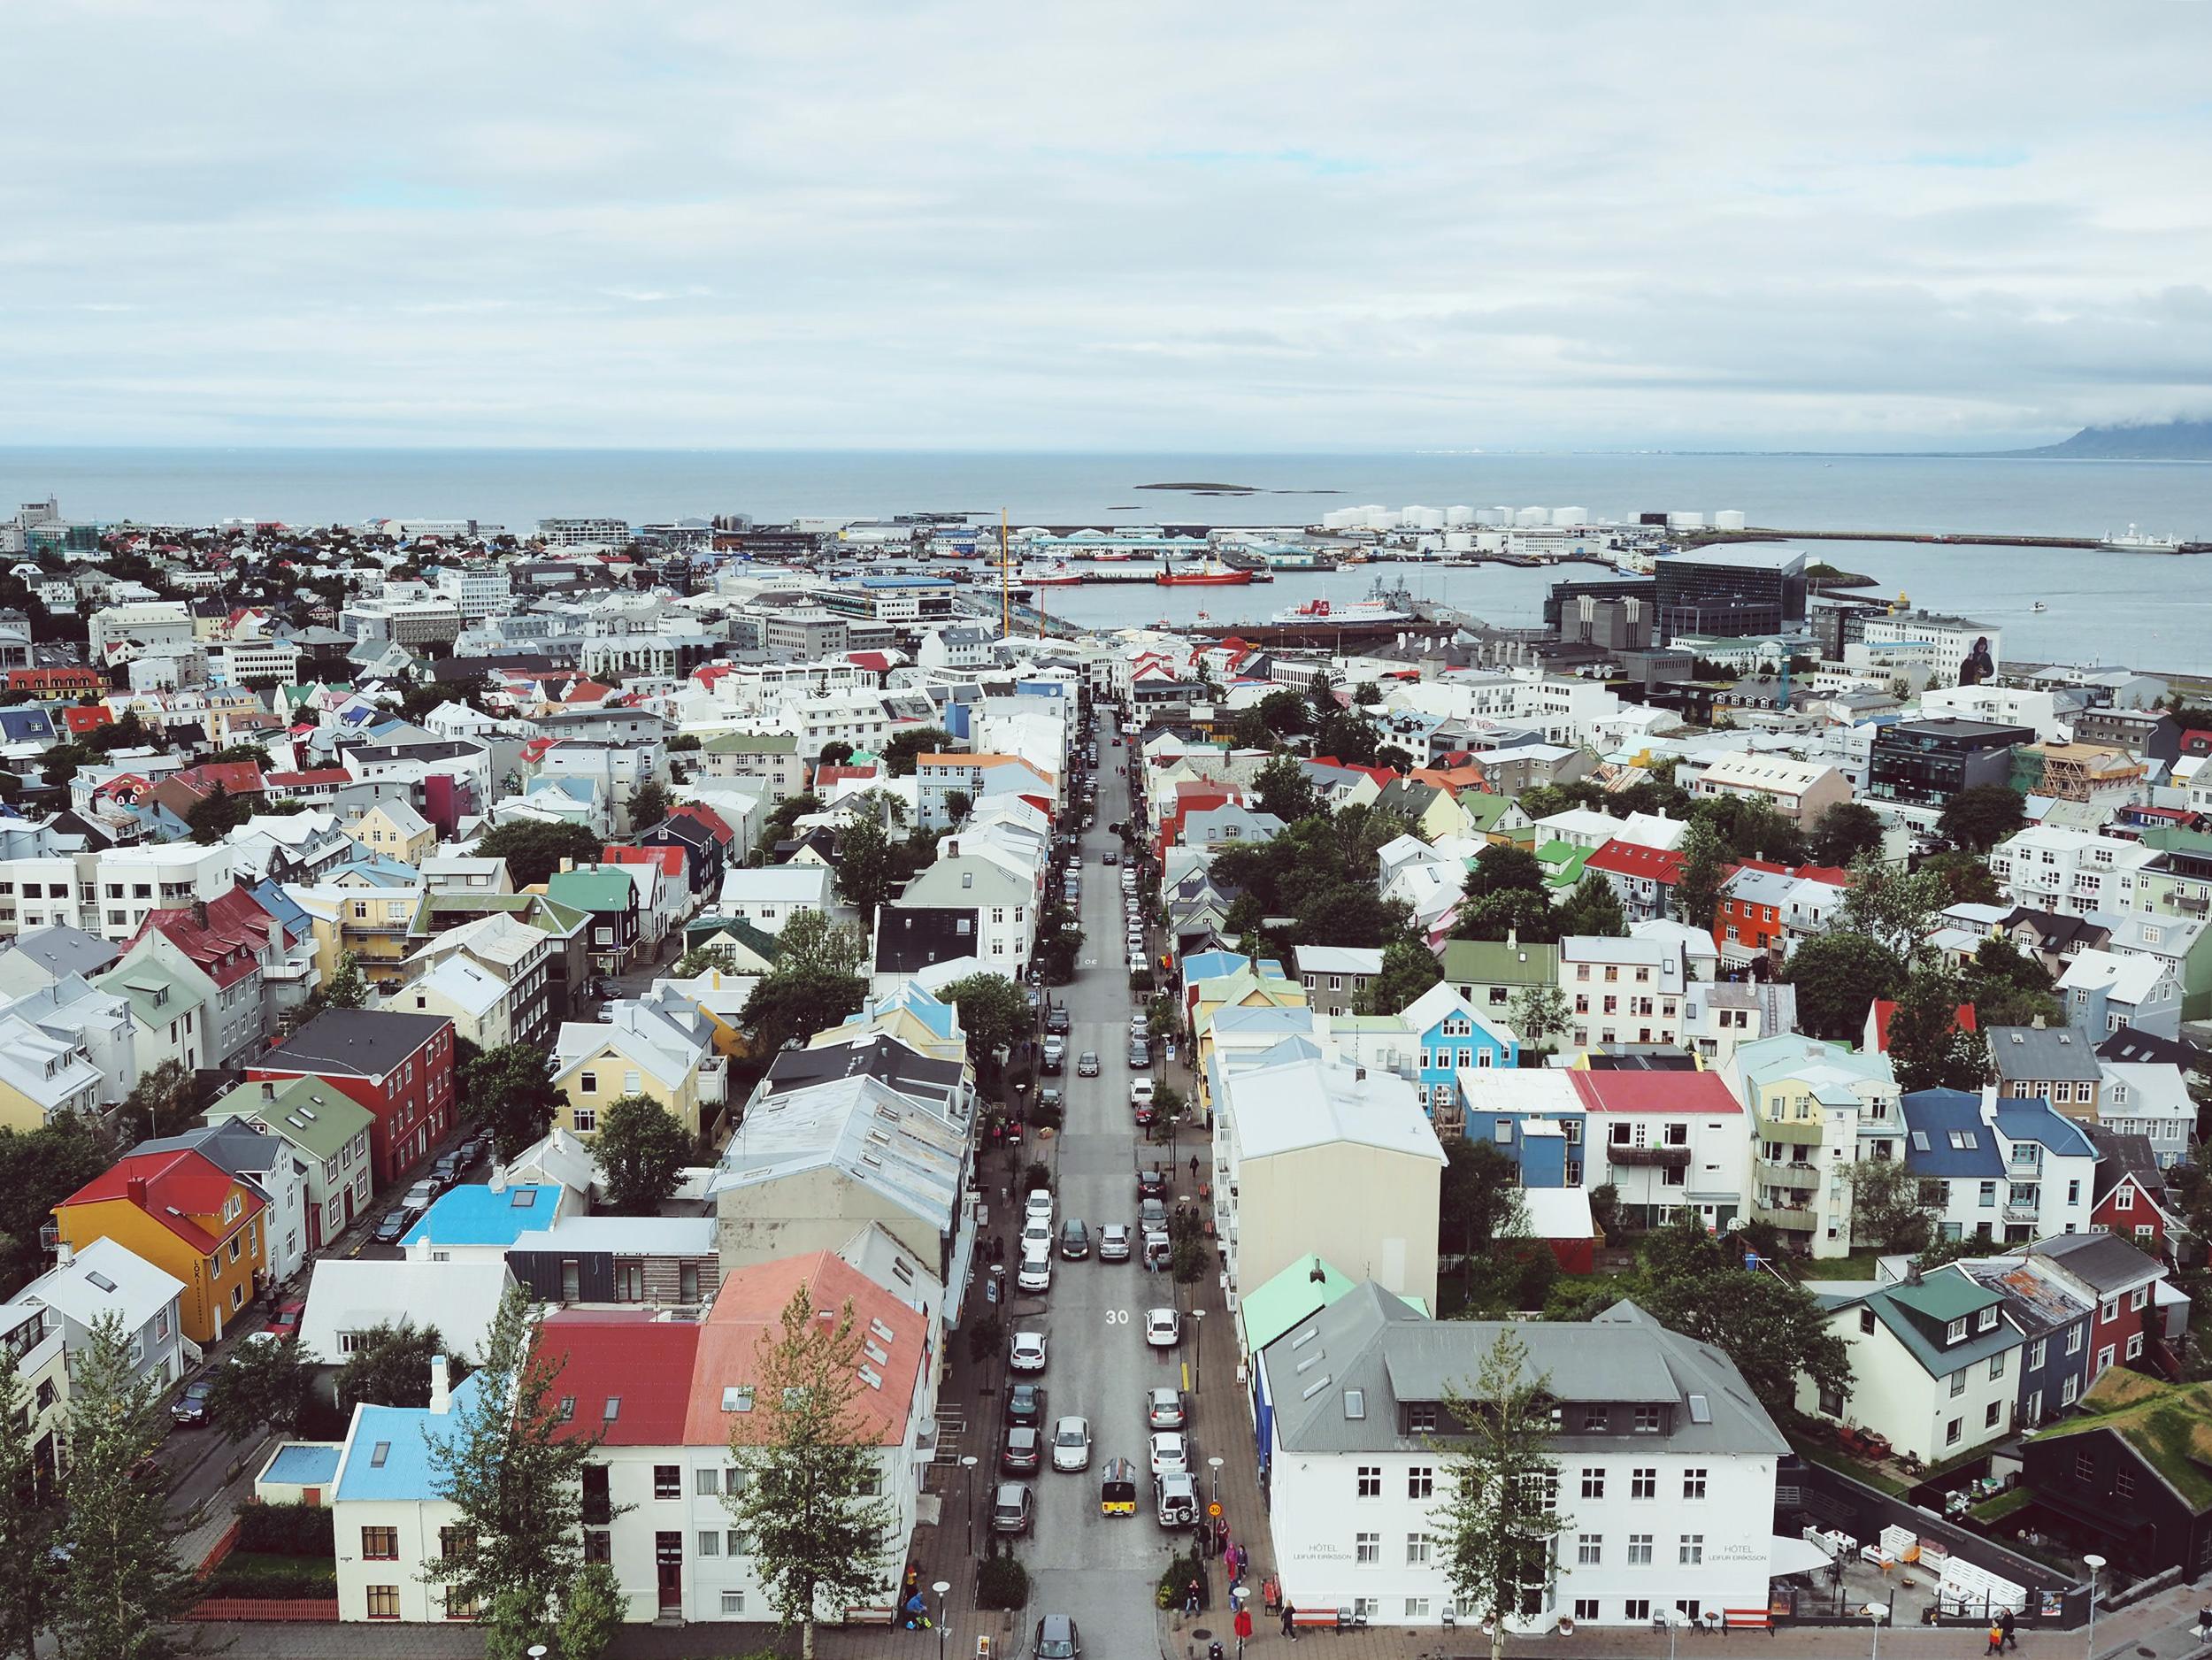 Postcard from Reykjavik